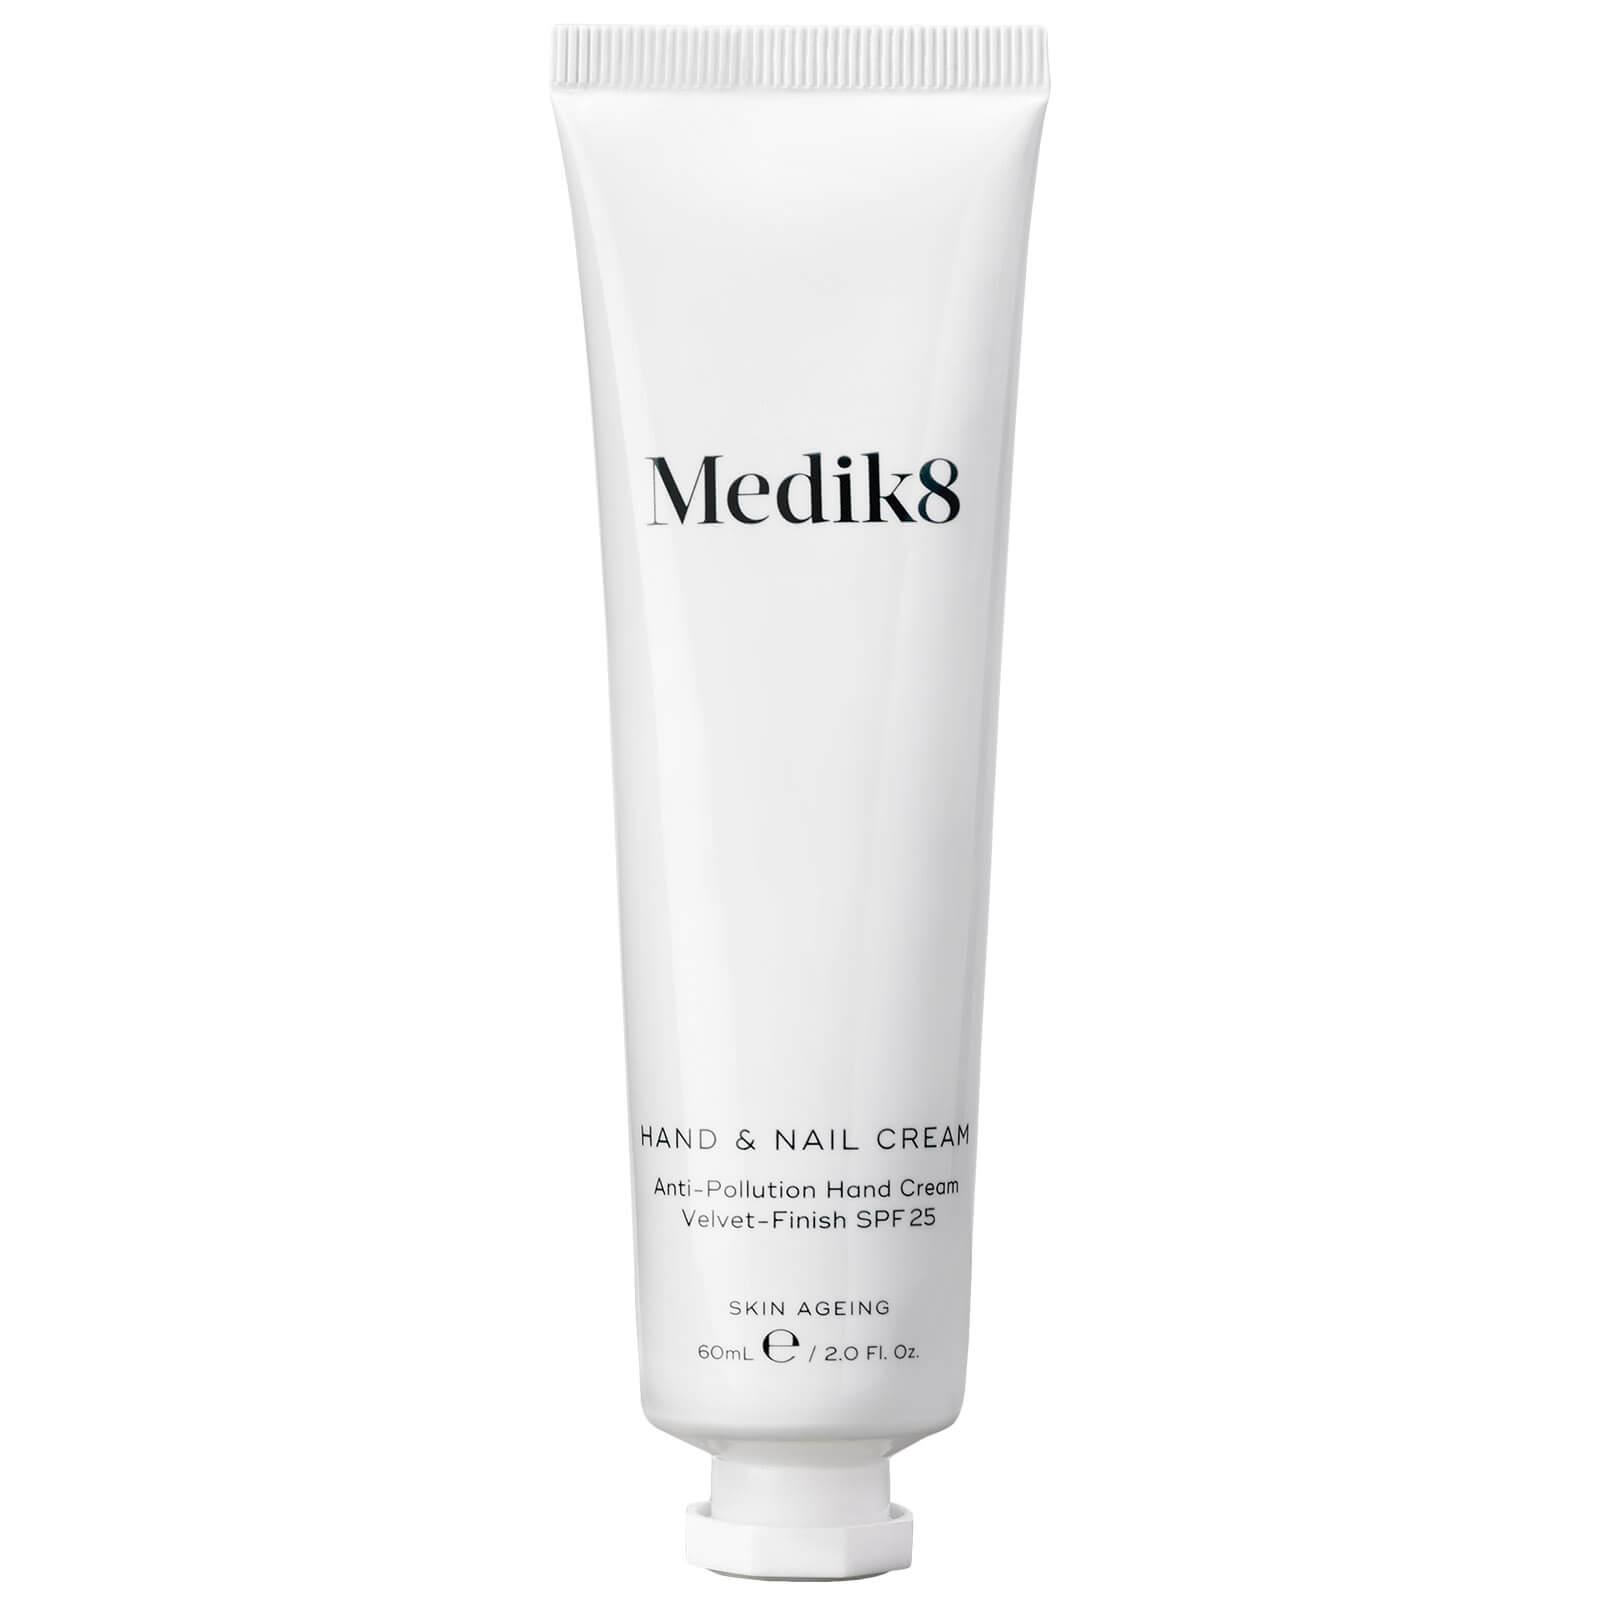 Купить Medik8 Hand & Nail Cream 60ml